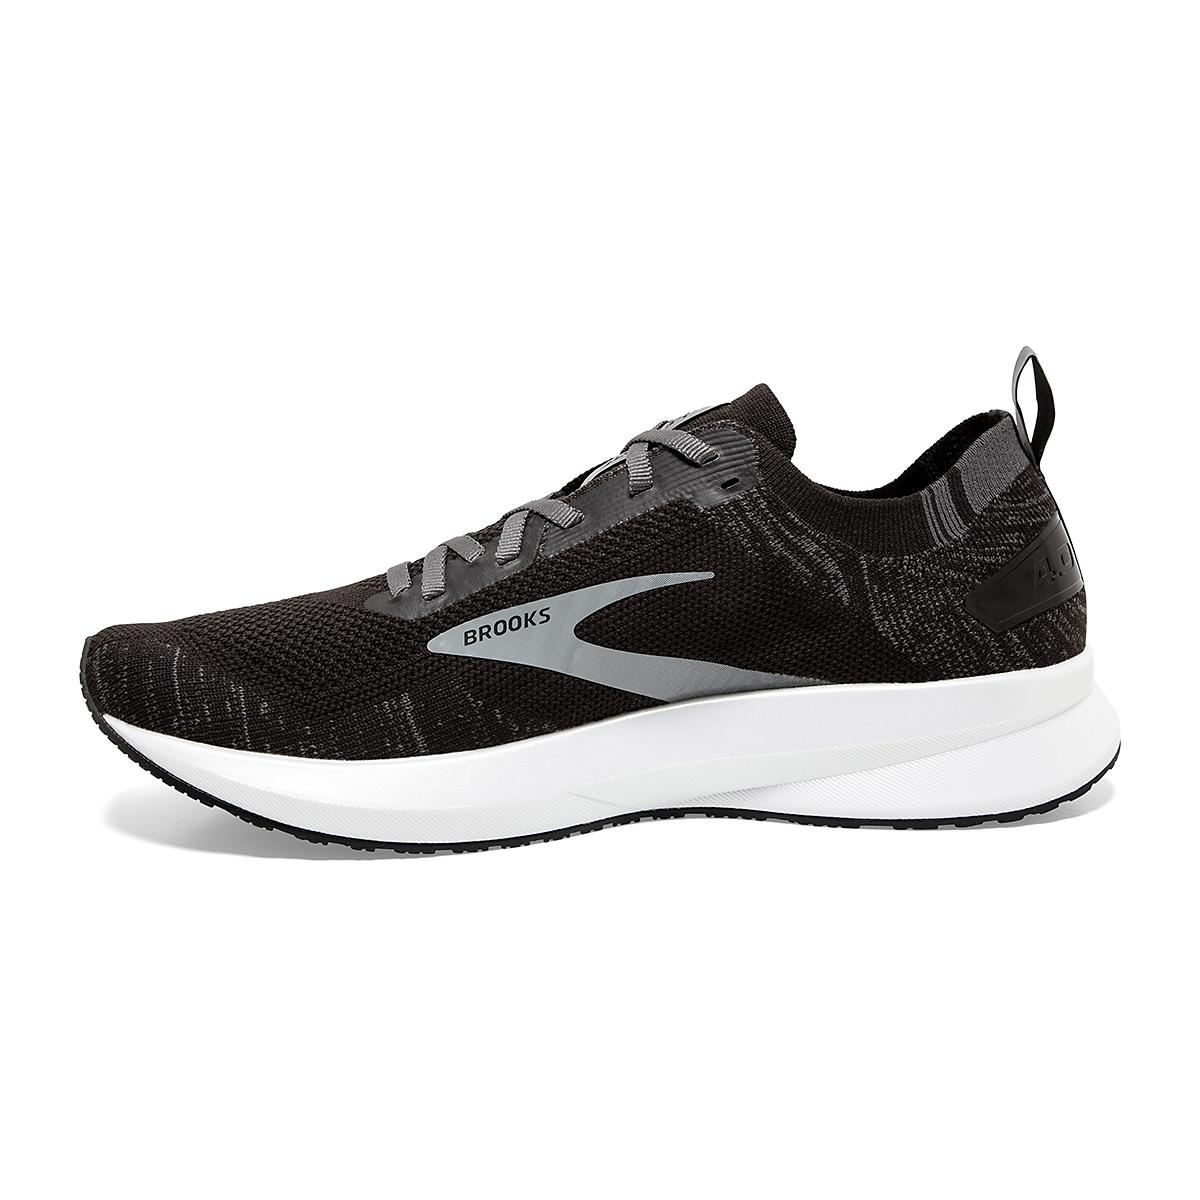 Women's Brooks Levitate 4 Running Shoe - Color: Black/Blackened Pearl/White - Size: 5.5 - Width: Regular, Black/Blackened Pearl/White, large, image 2